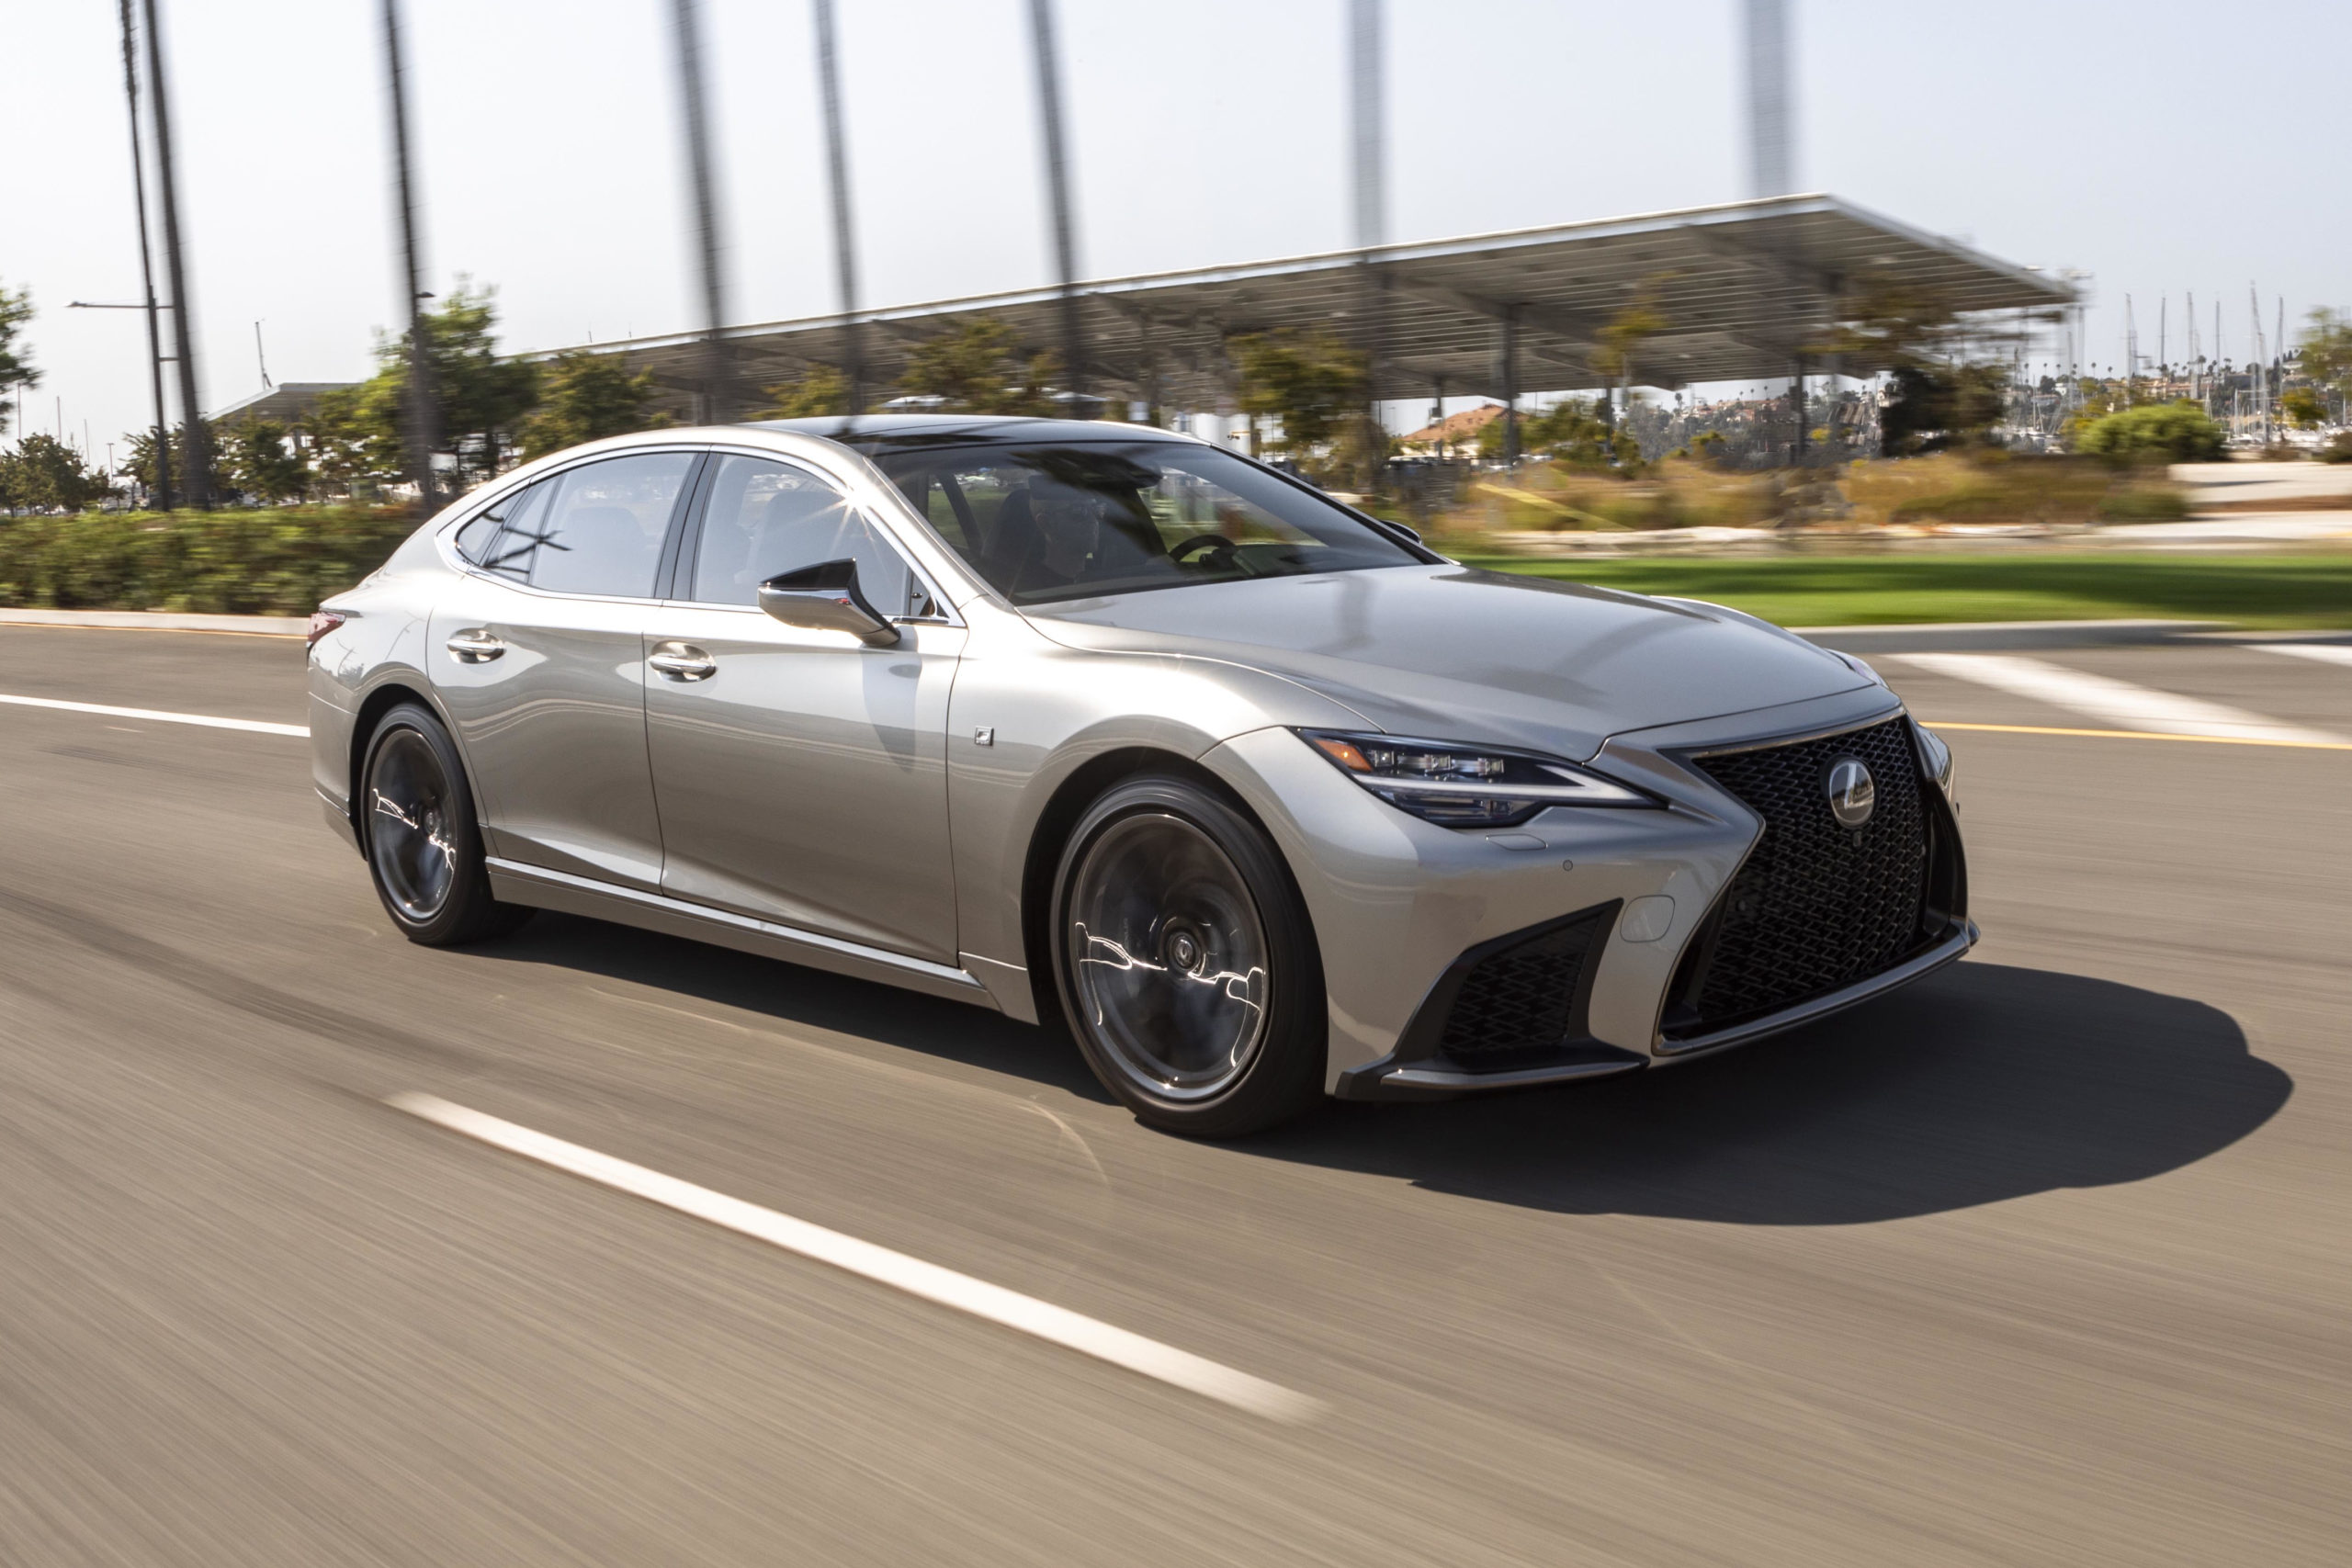 full-size luxury sedans - Lexus LS